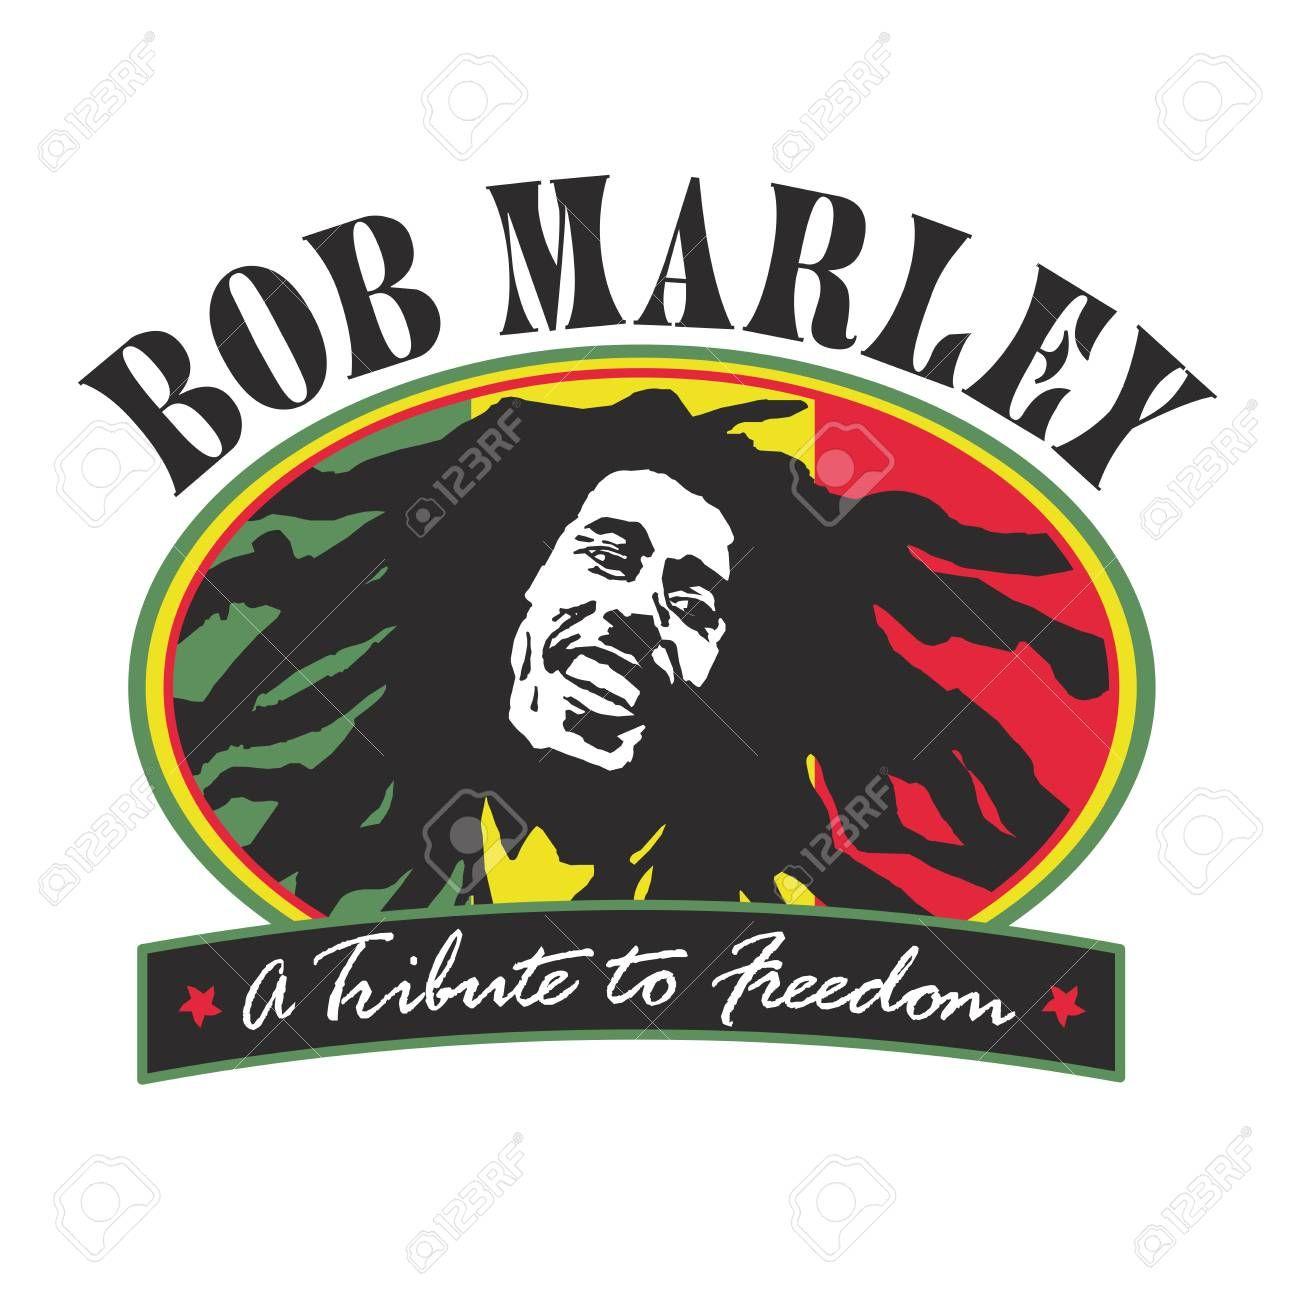 Jamaica Freedom Bob Marley Illustration Sponsored Freedom Jamaica Bob Illustration Marley Bob Marley Marley Vector Logo